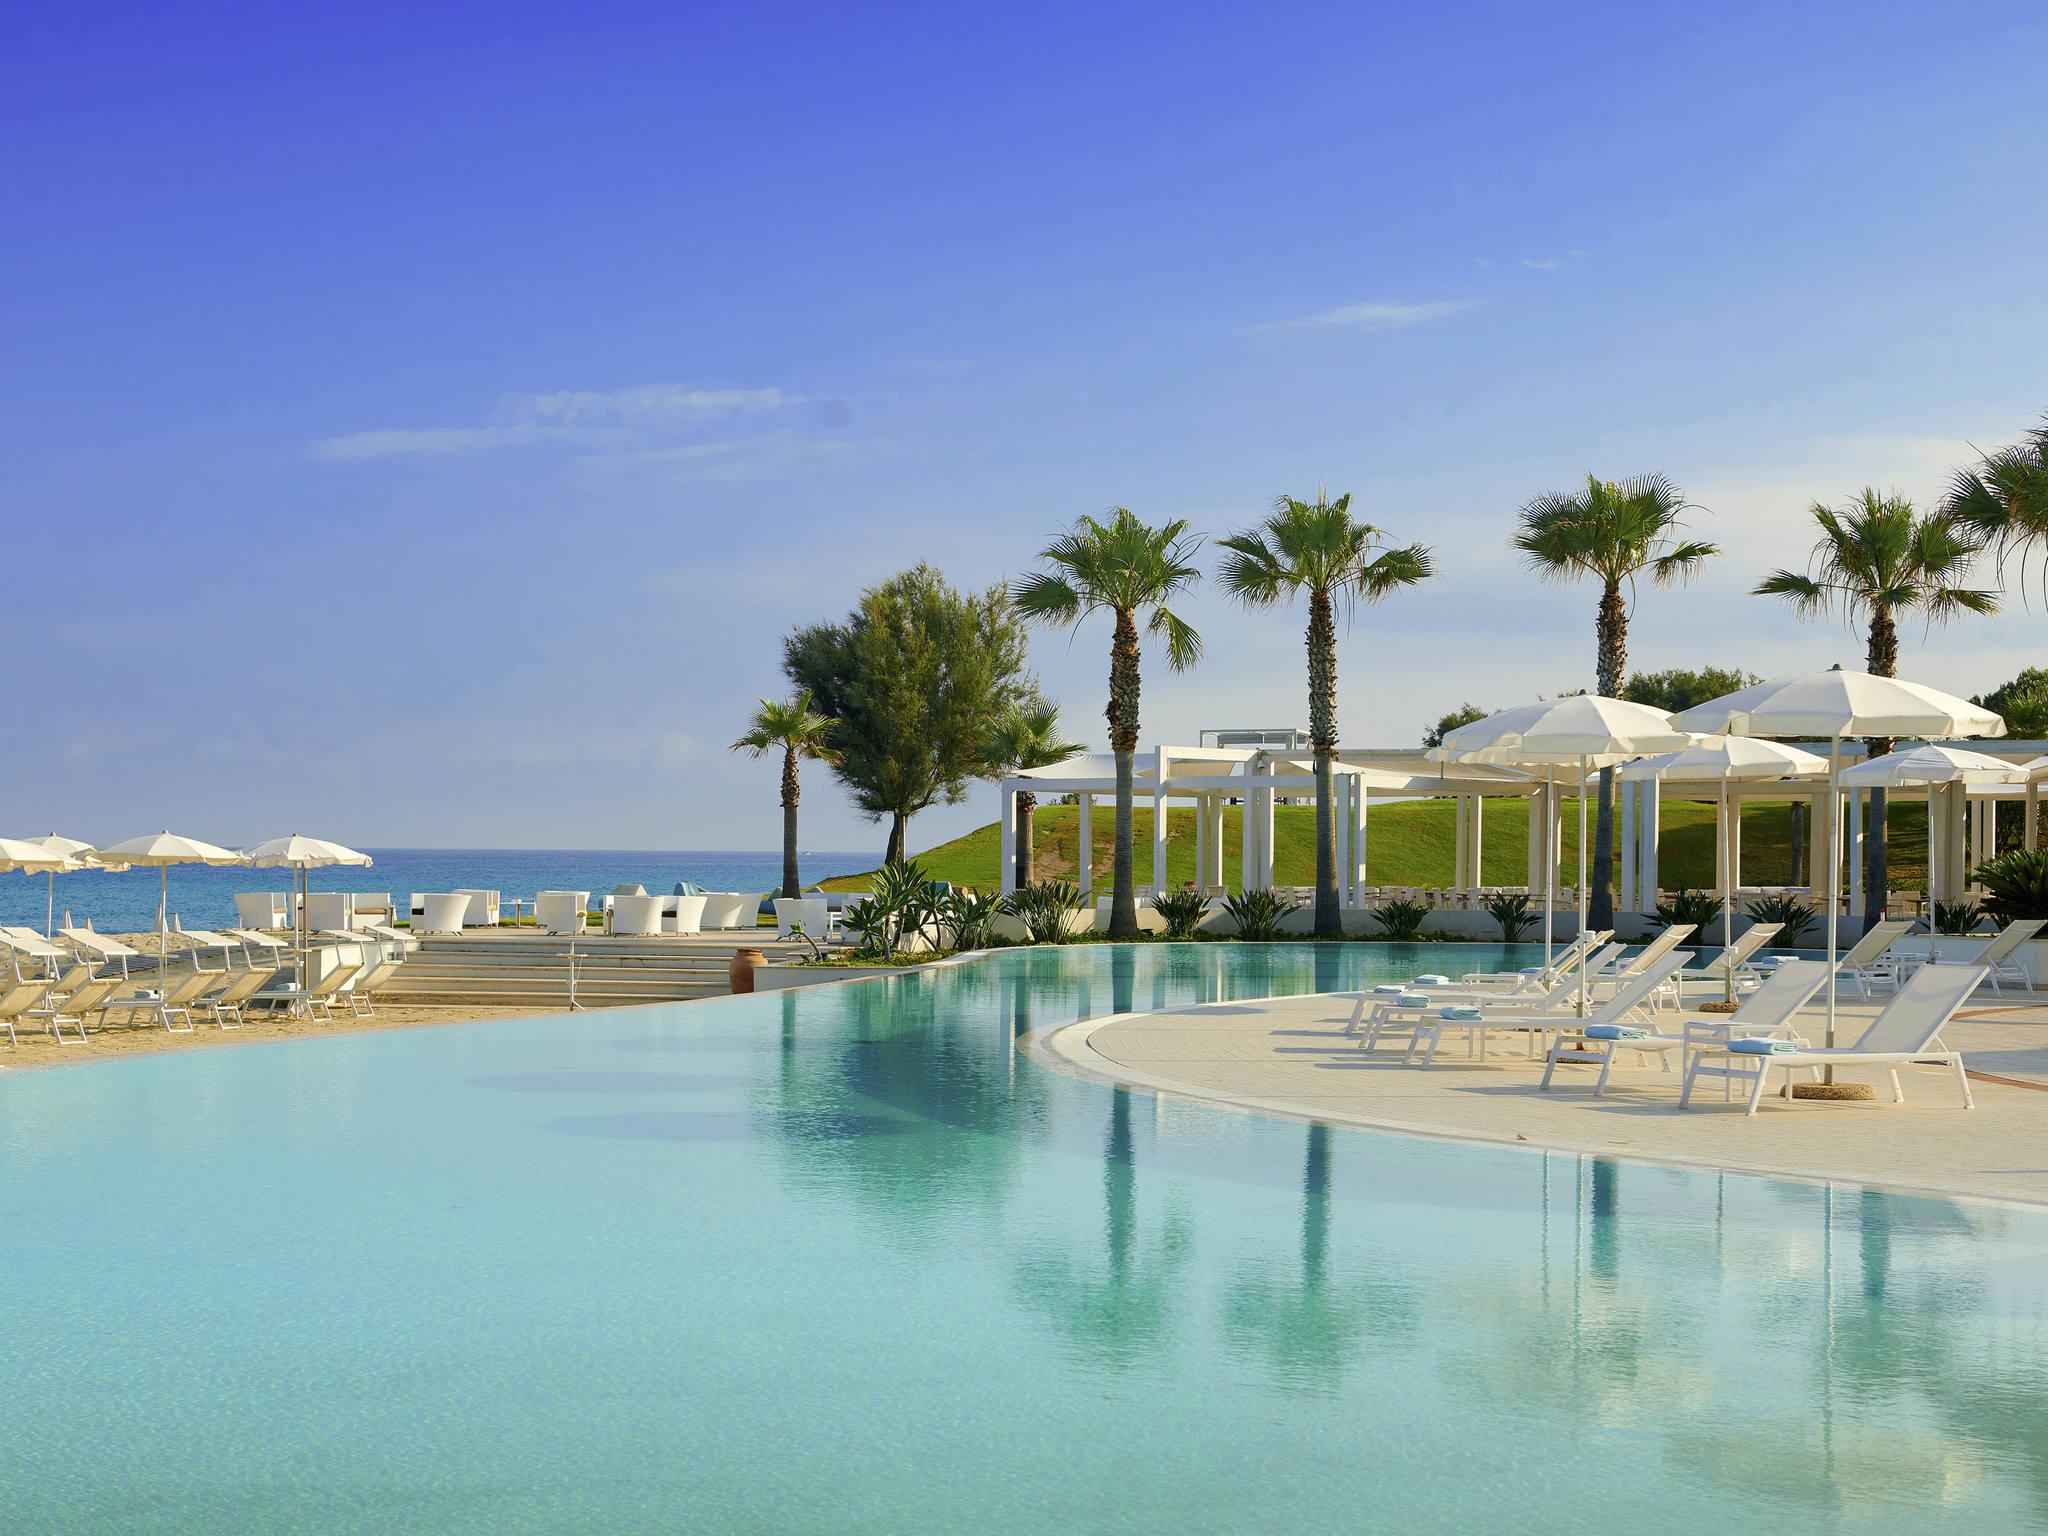 Отель — Capovaticano Resort Thalasso & Spa - MGallery by Sofitel